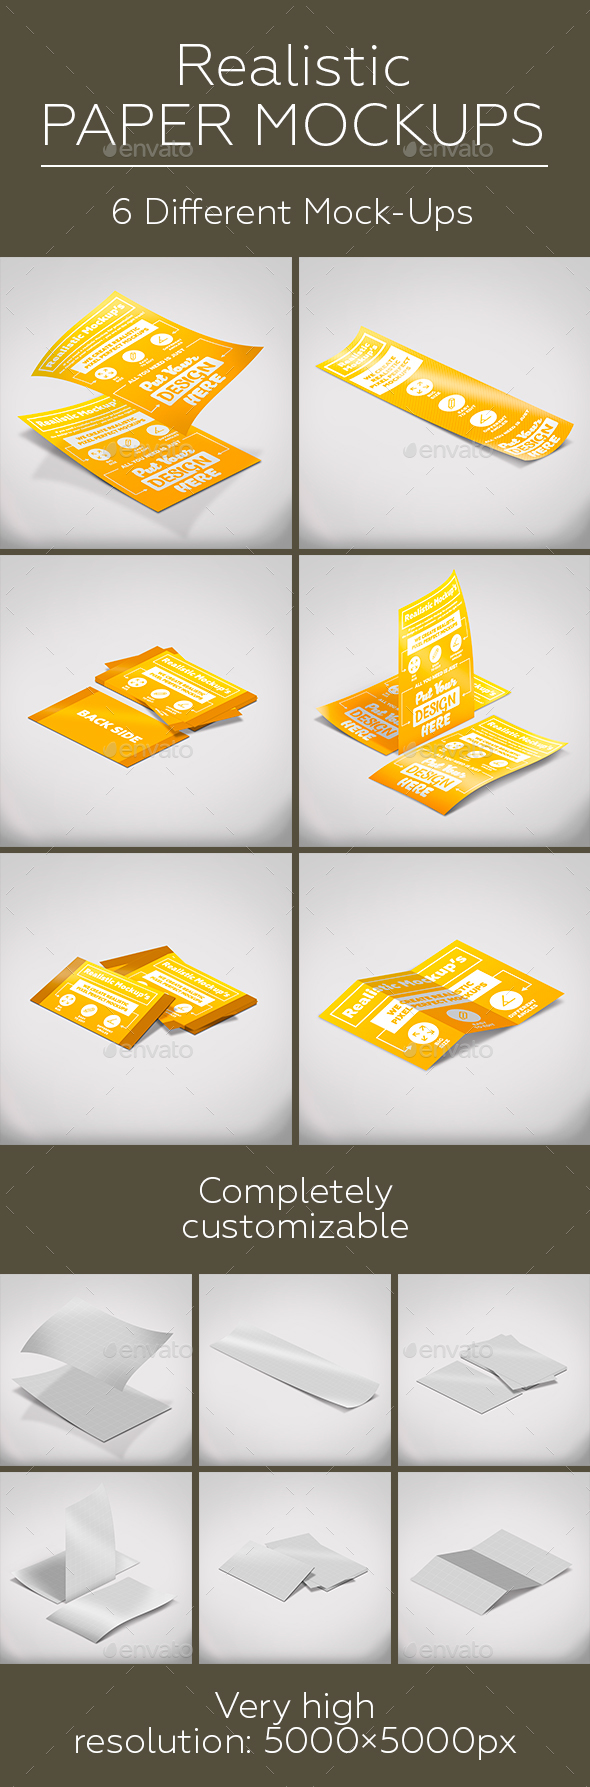 Paper Mock-Ups | A4 Portrait Paper | Business Cards | A4 Tri-Fold Leaflet - Print Product Mock-Ups